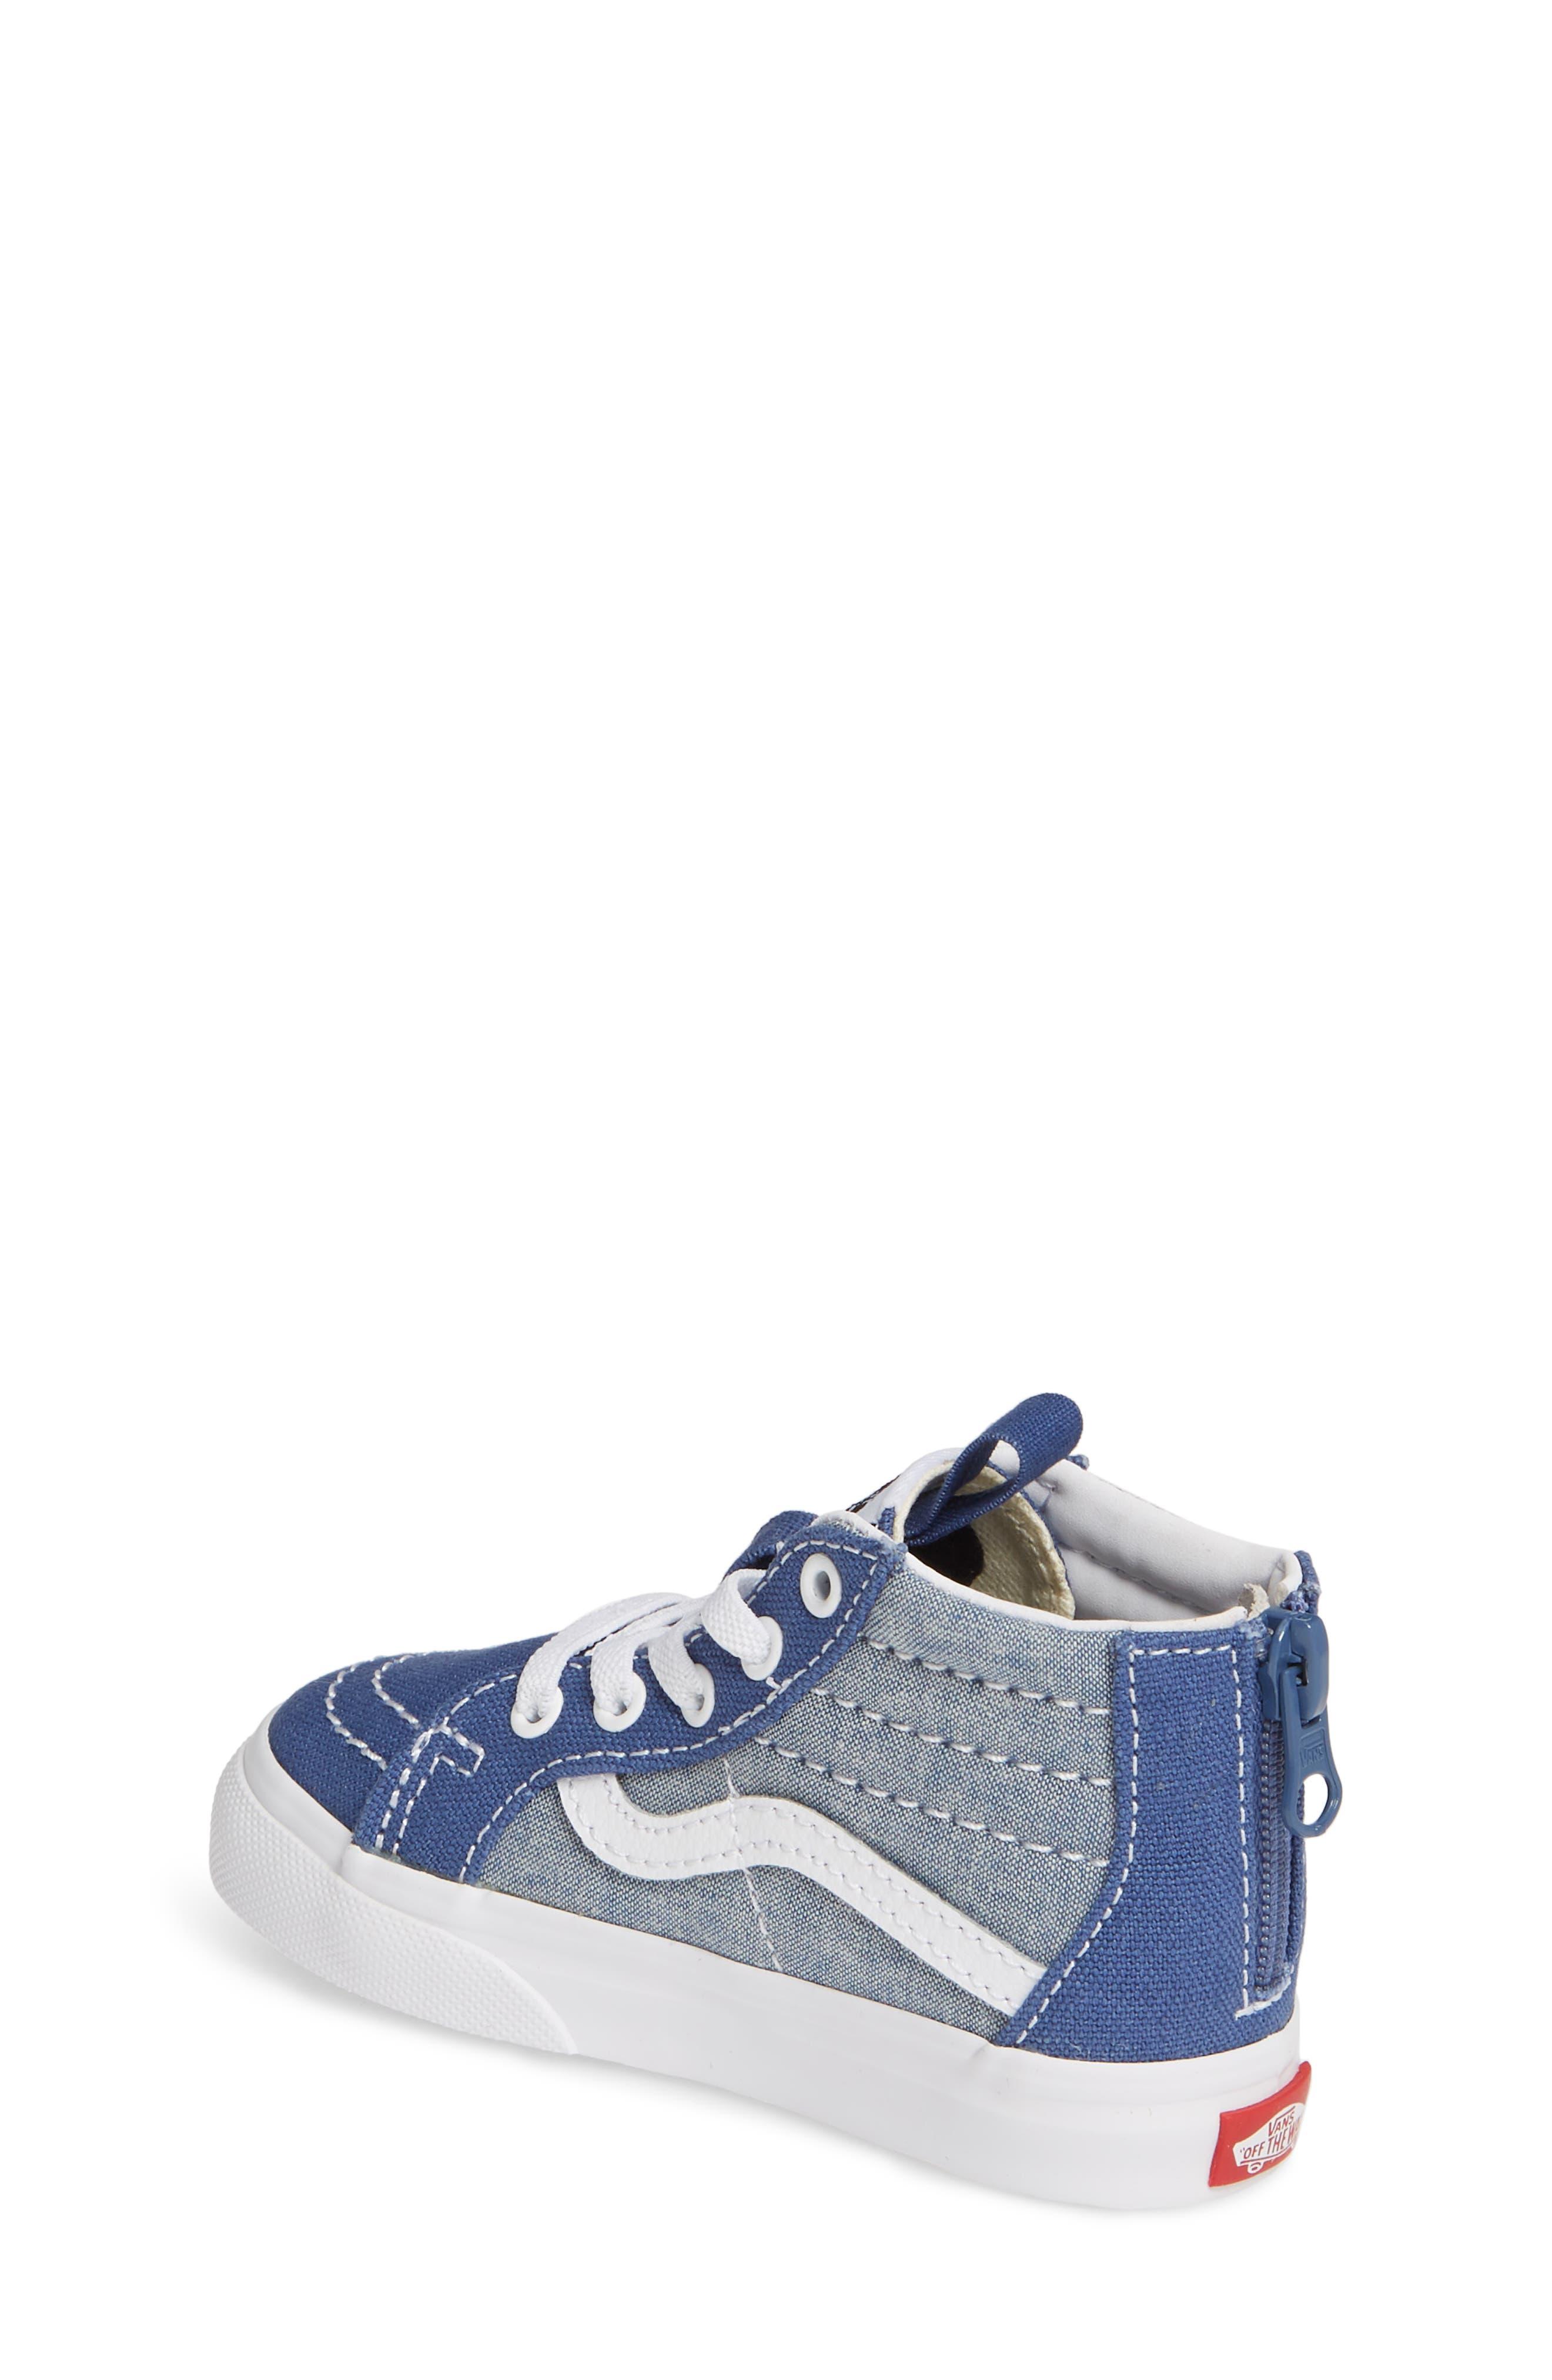 VANS, 'Sk8-Hi' Sneaker, Alternate thumbnail 2, color, CHAMBRAY CANVAS NAVY/ WHITE